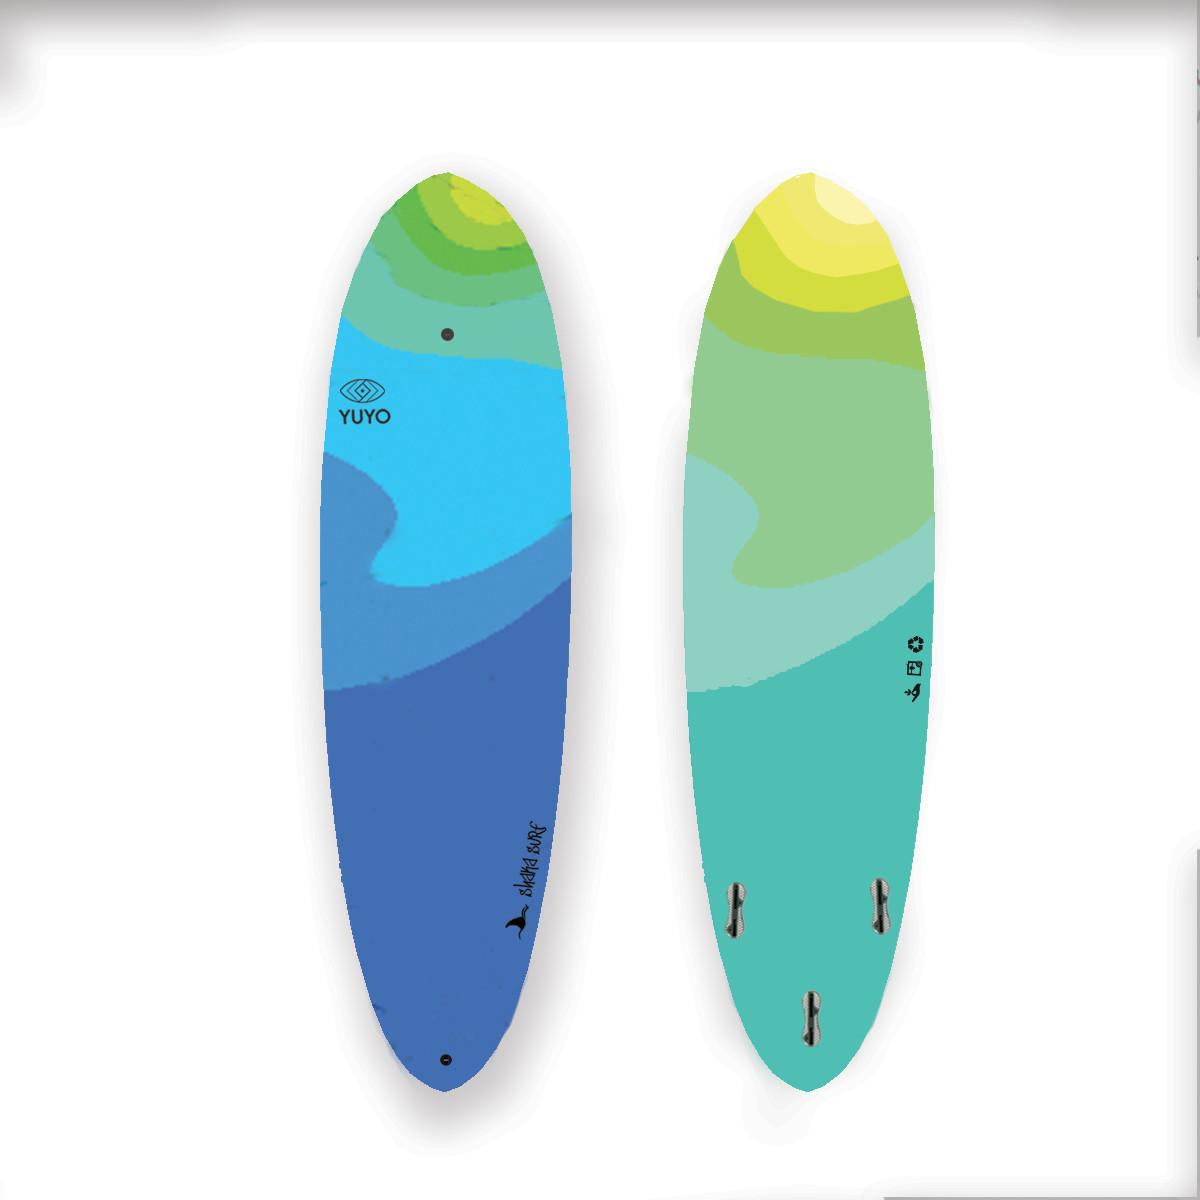 Interactive Surfboard Design Using Tech for Design